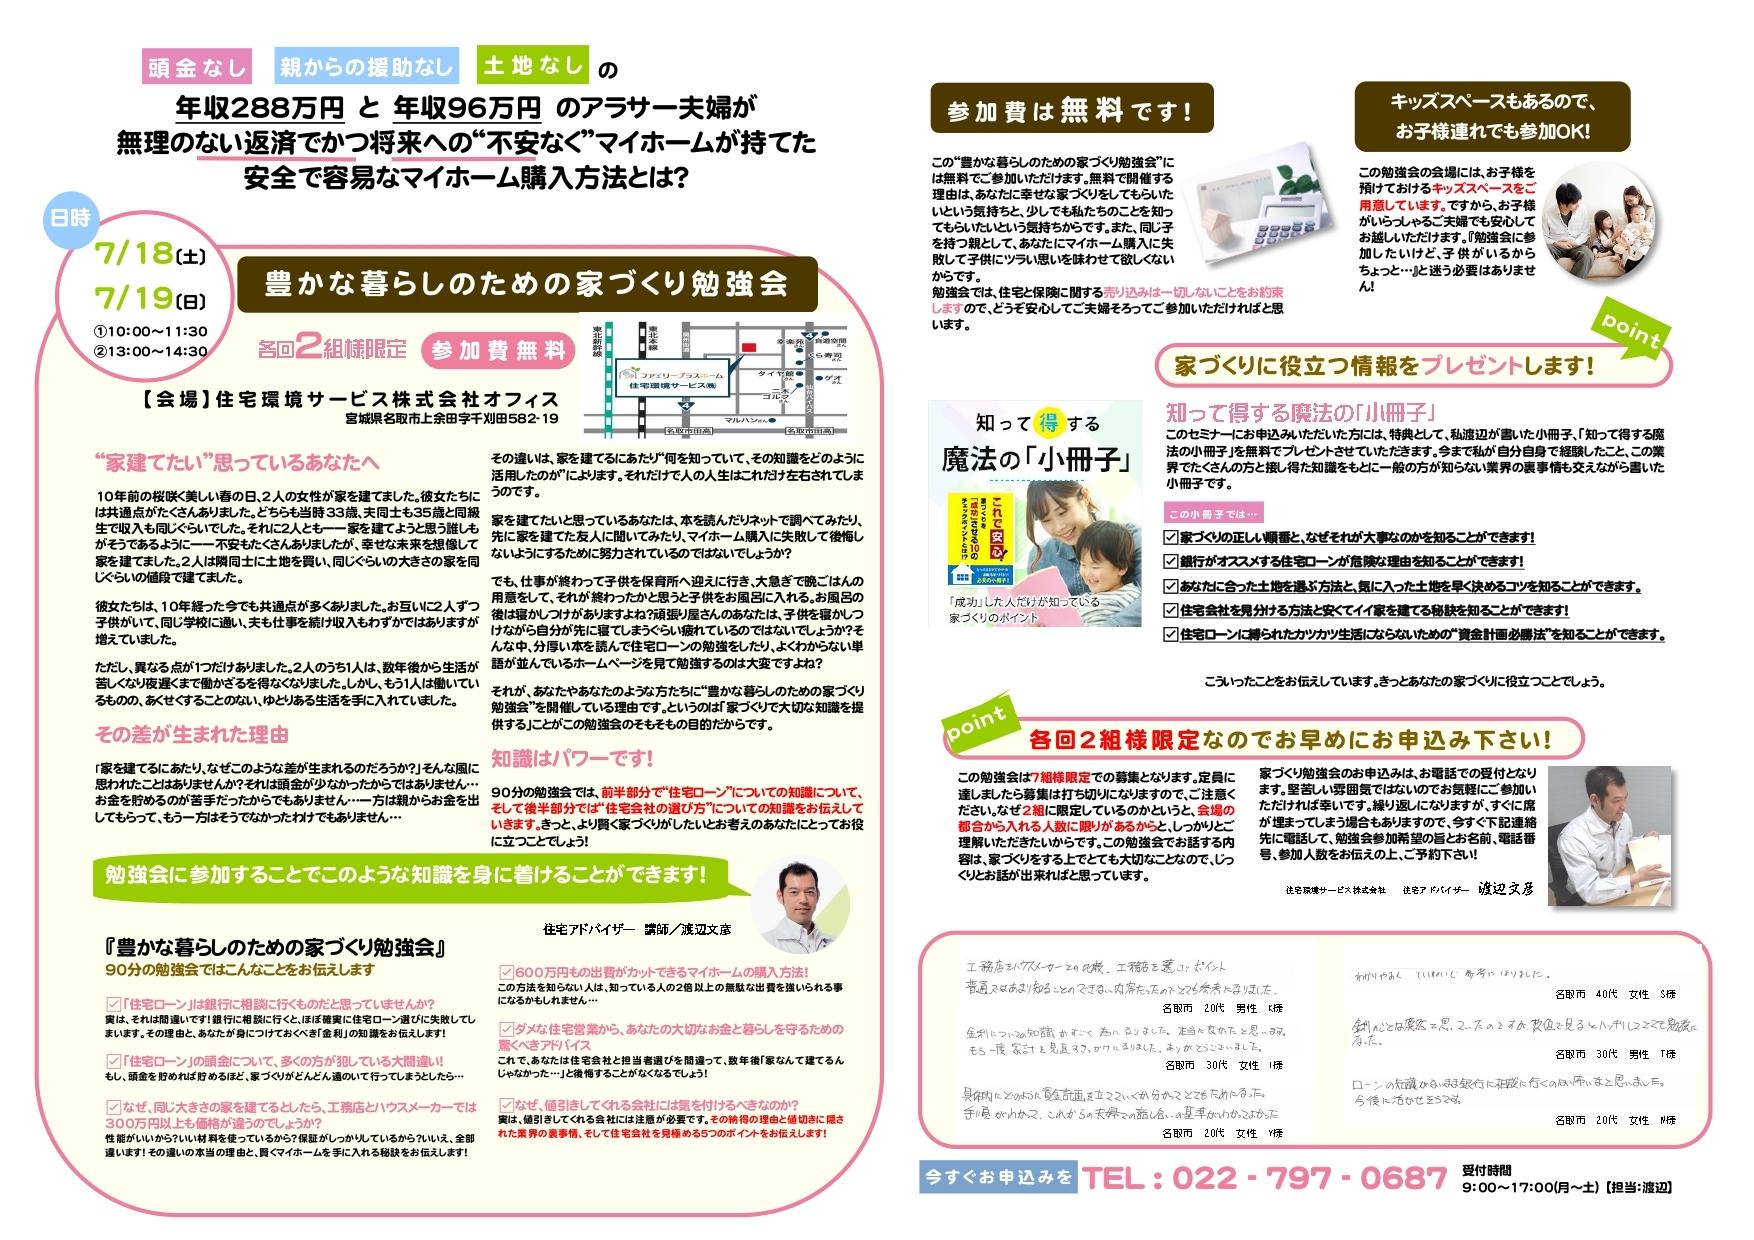 http://www.jutakukankyo-service.jp/ee35a6a3a35b49dd46e164c36844932b345342c8.jpg